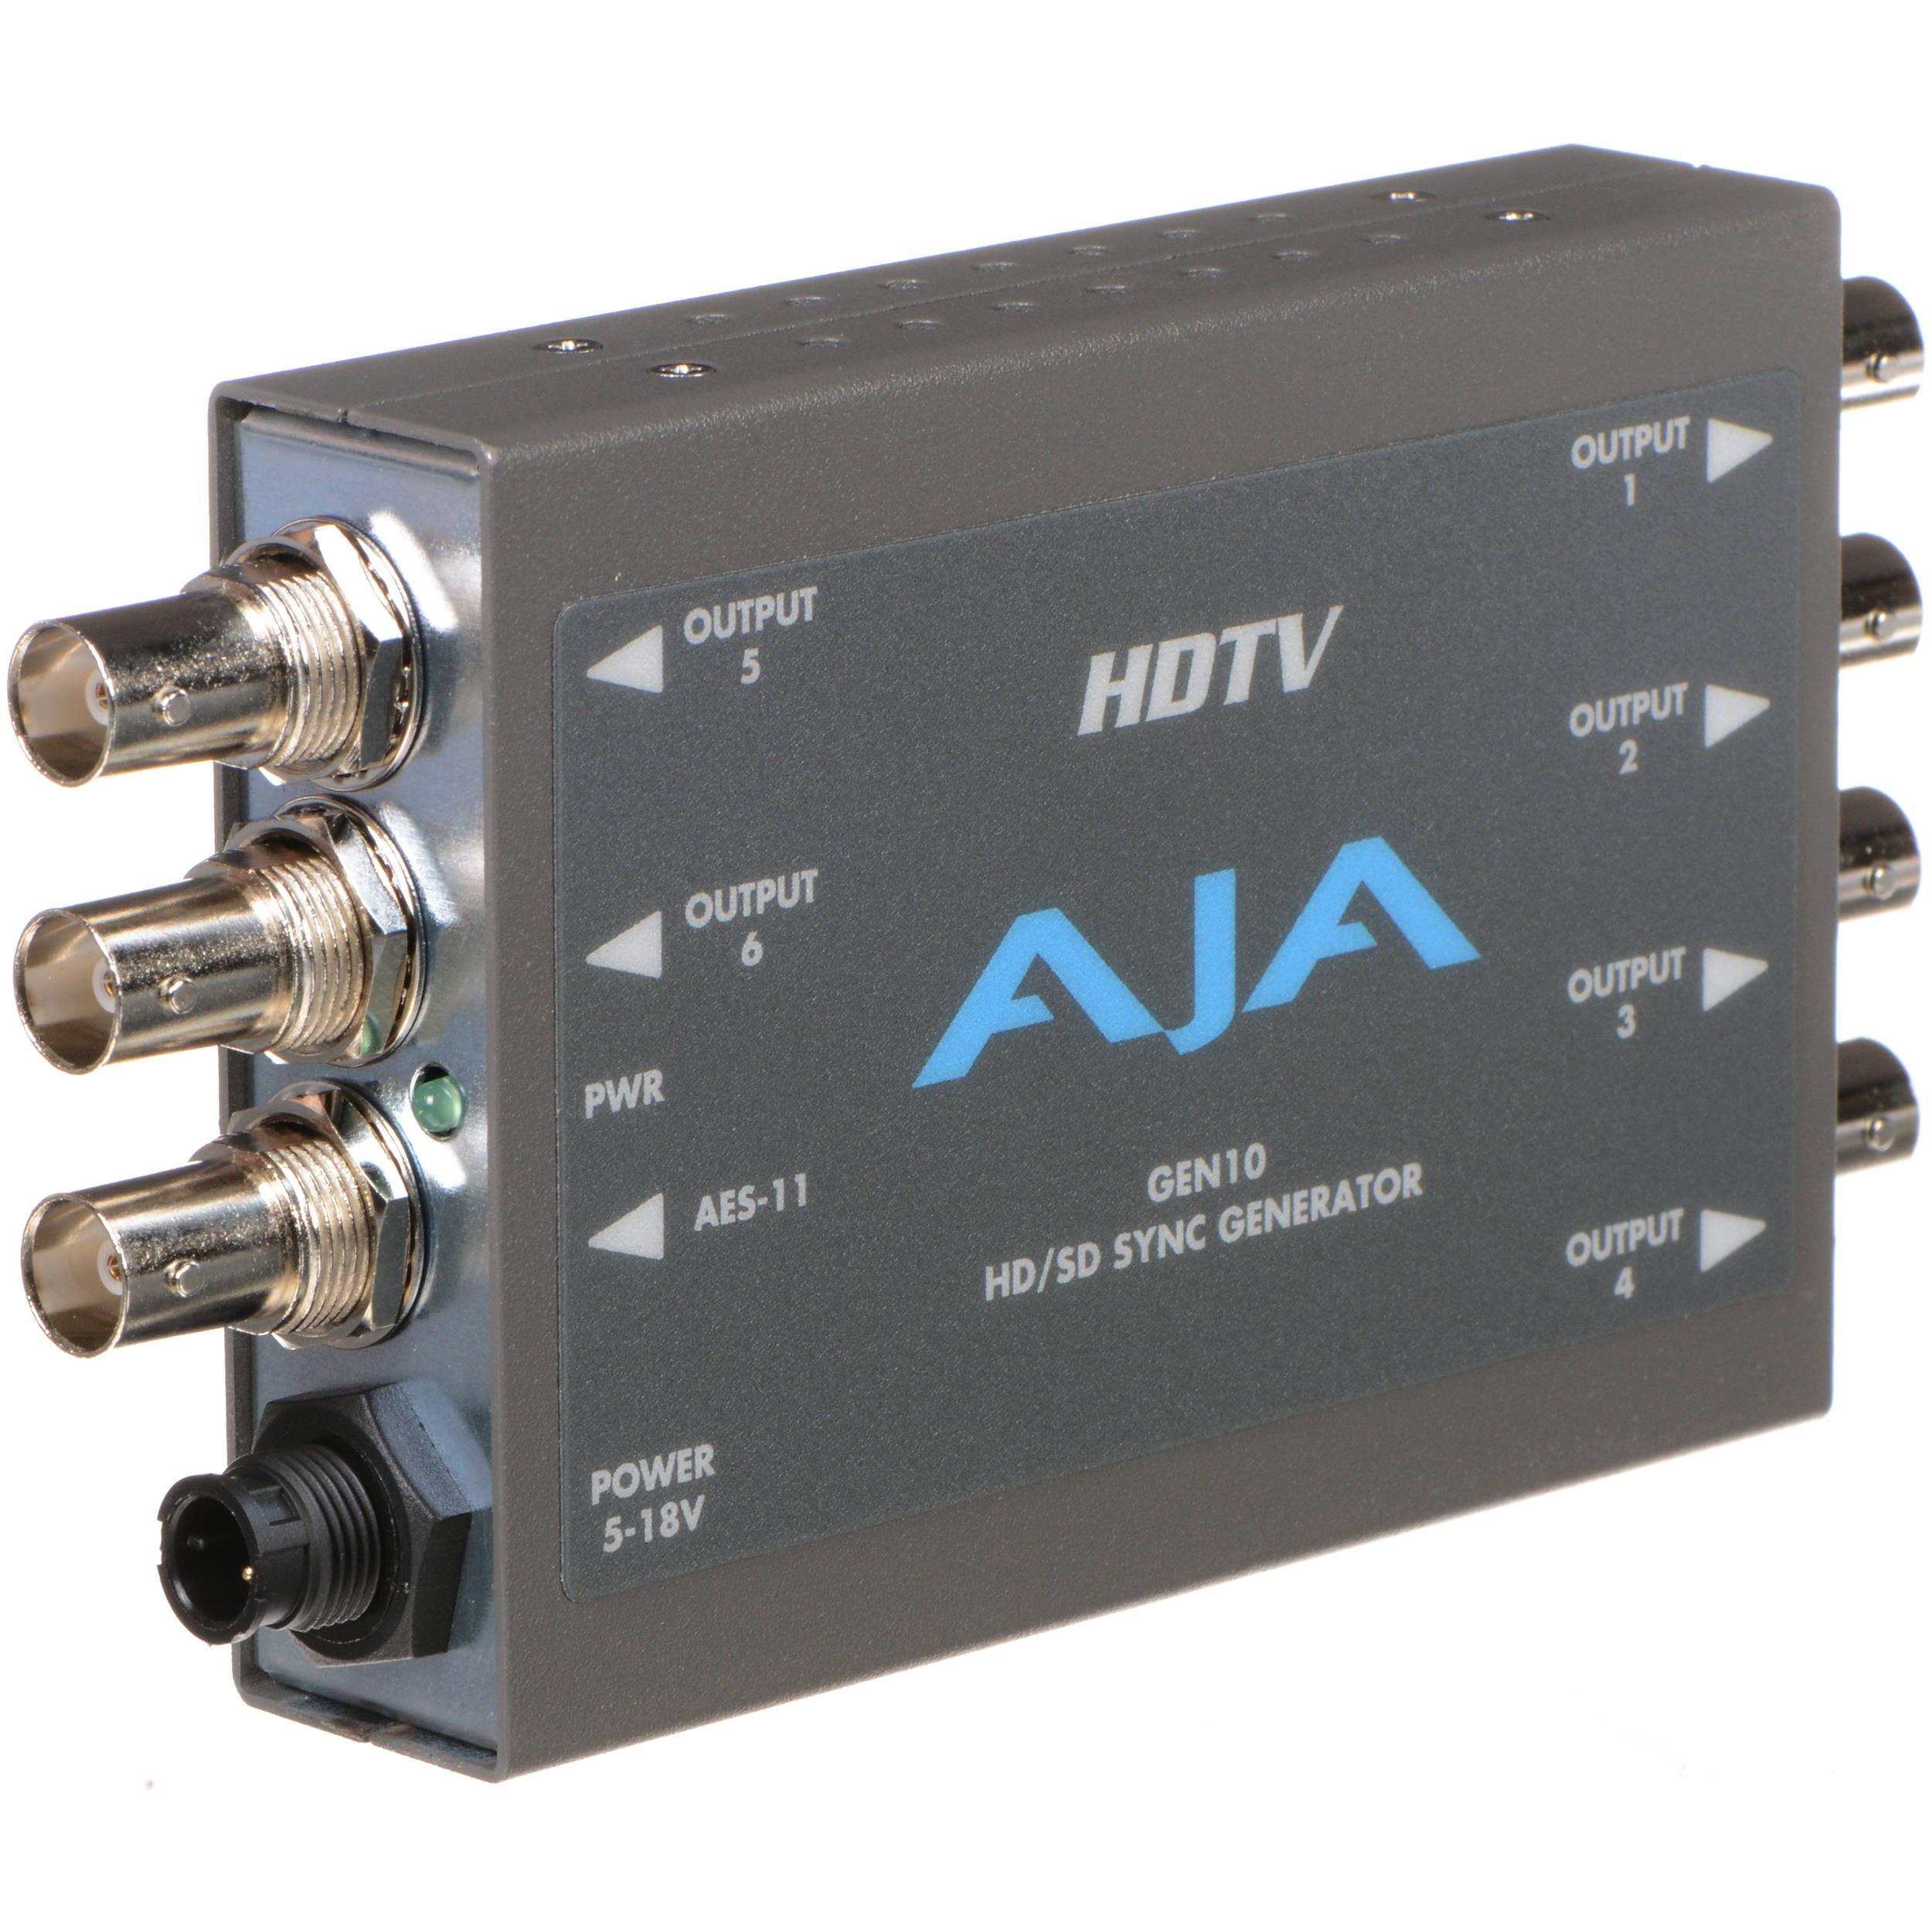 AJA GEN10 HD SD AES Sync Generator with Universal Power GEN10